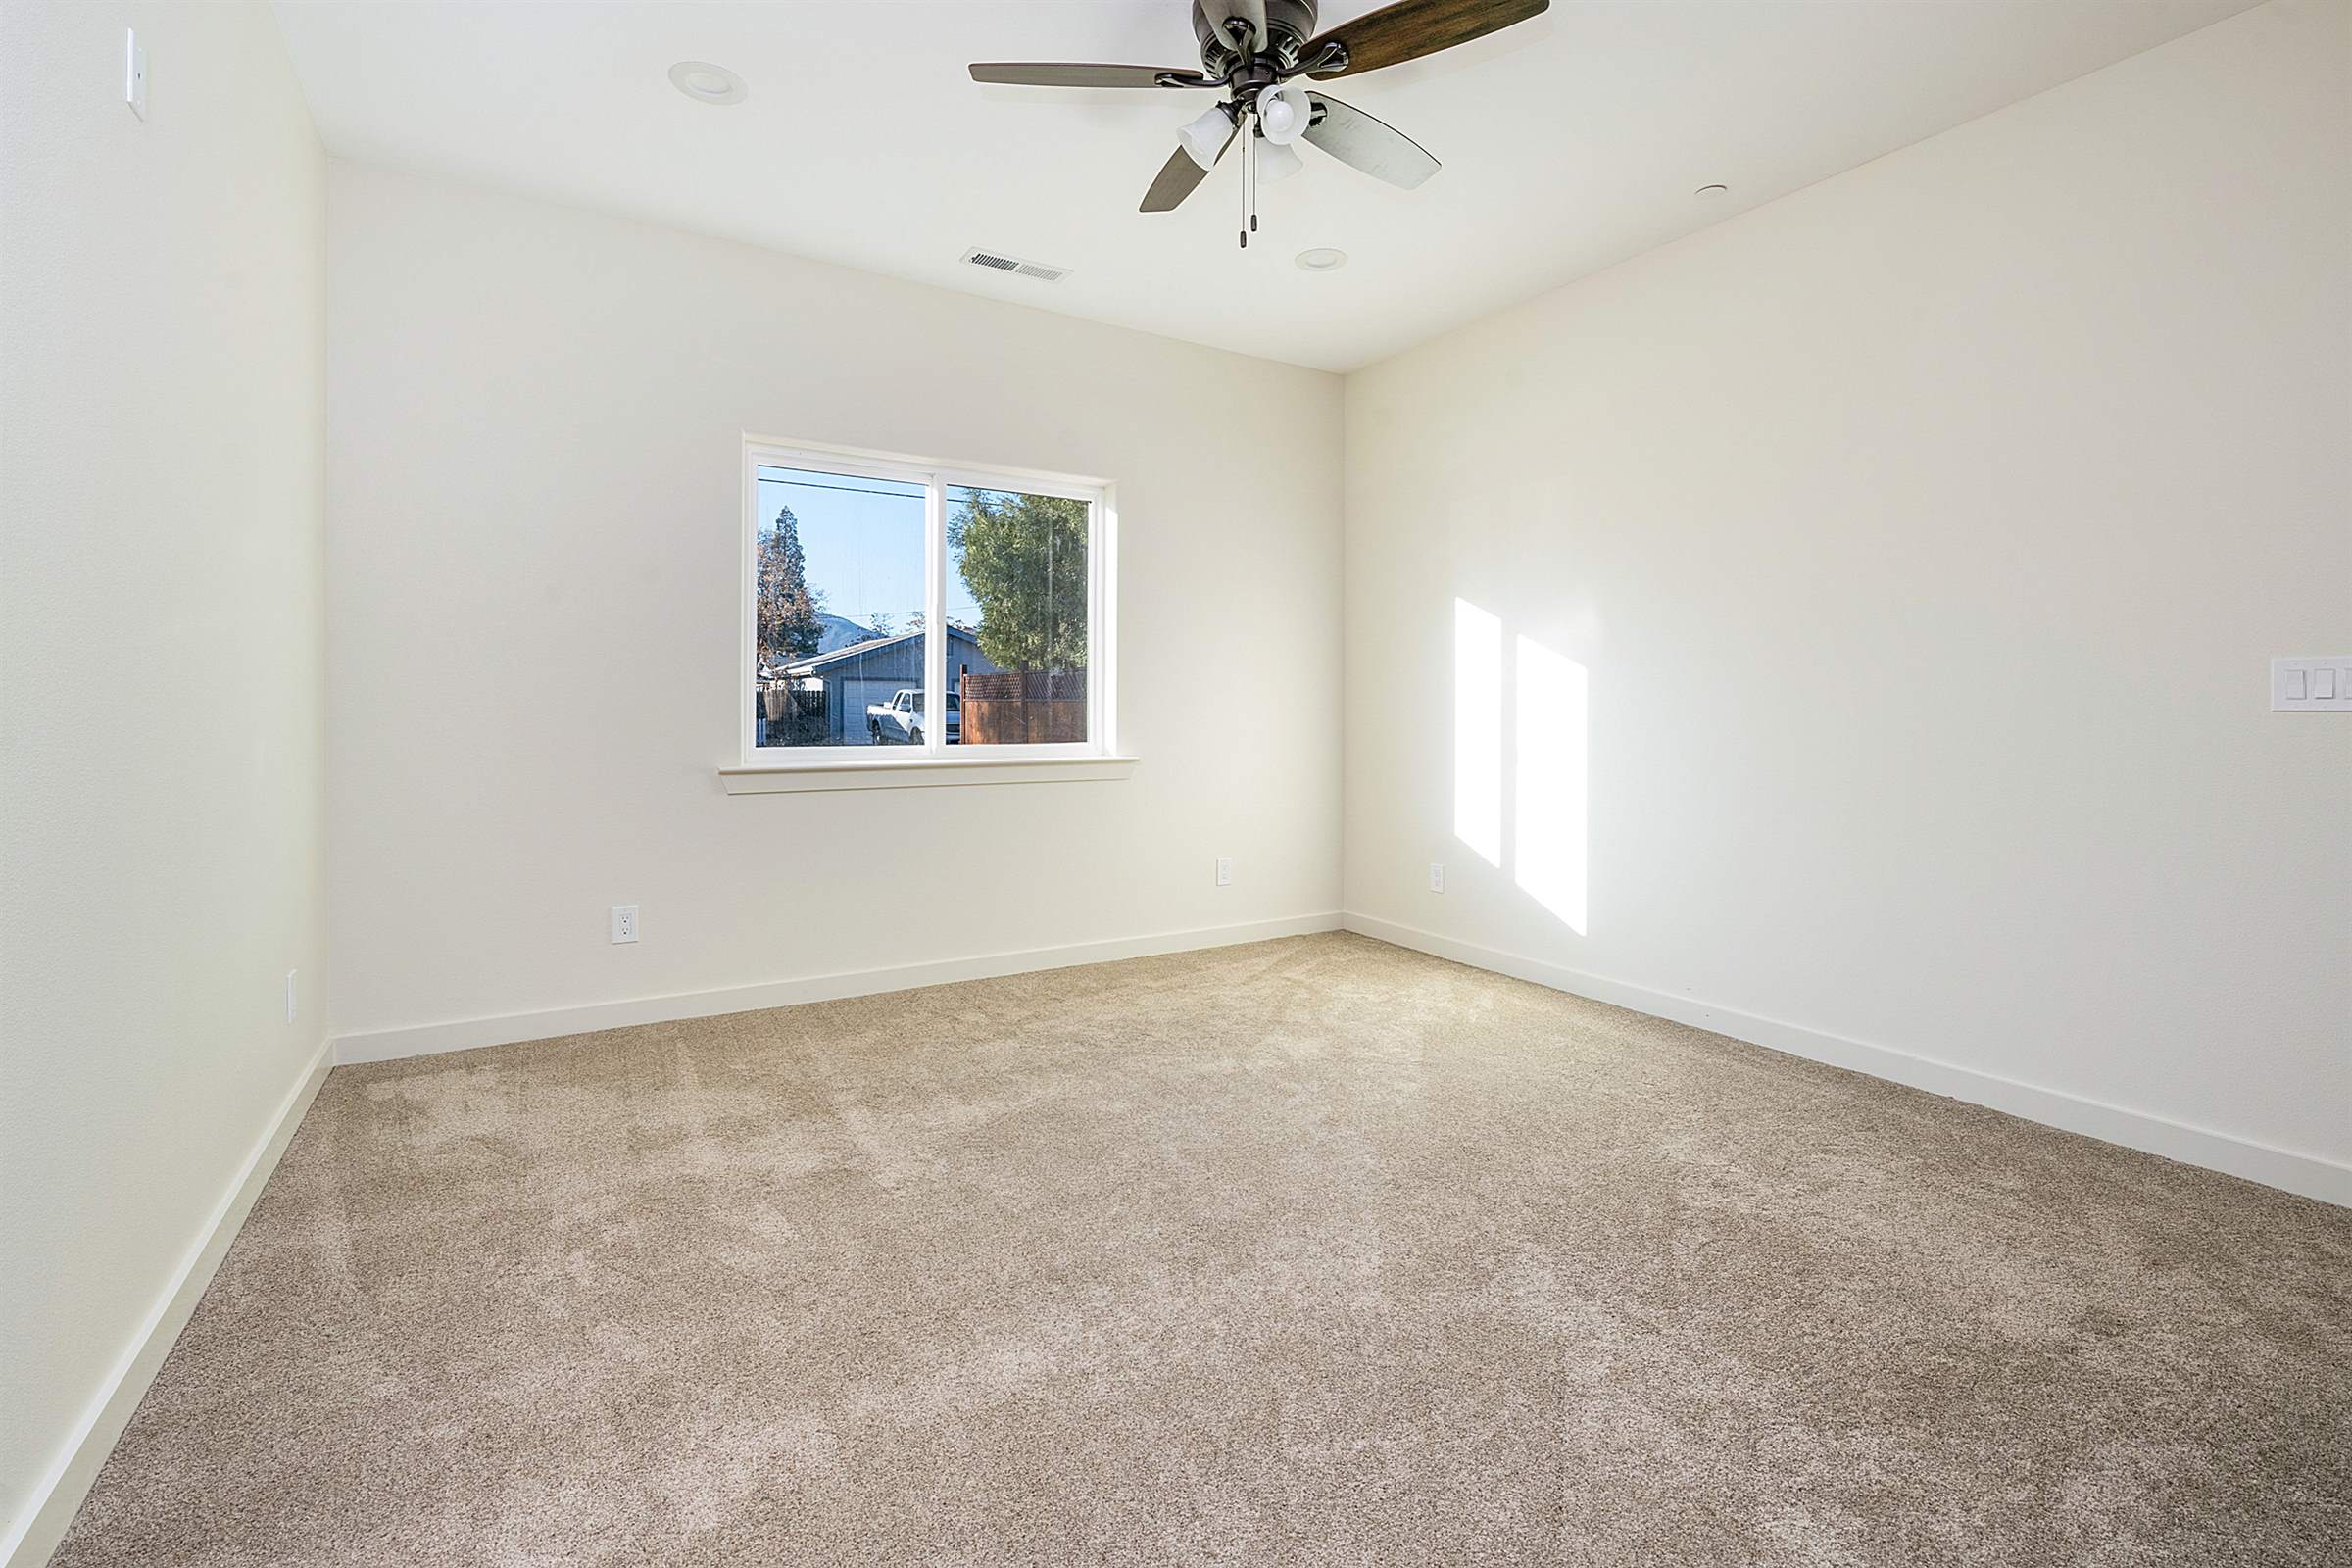 21072 Jackson Street, Middletown, CA 95461